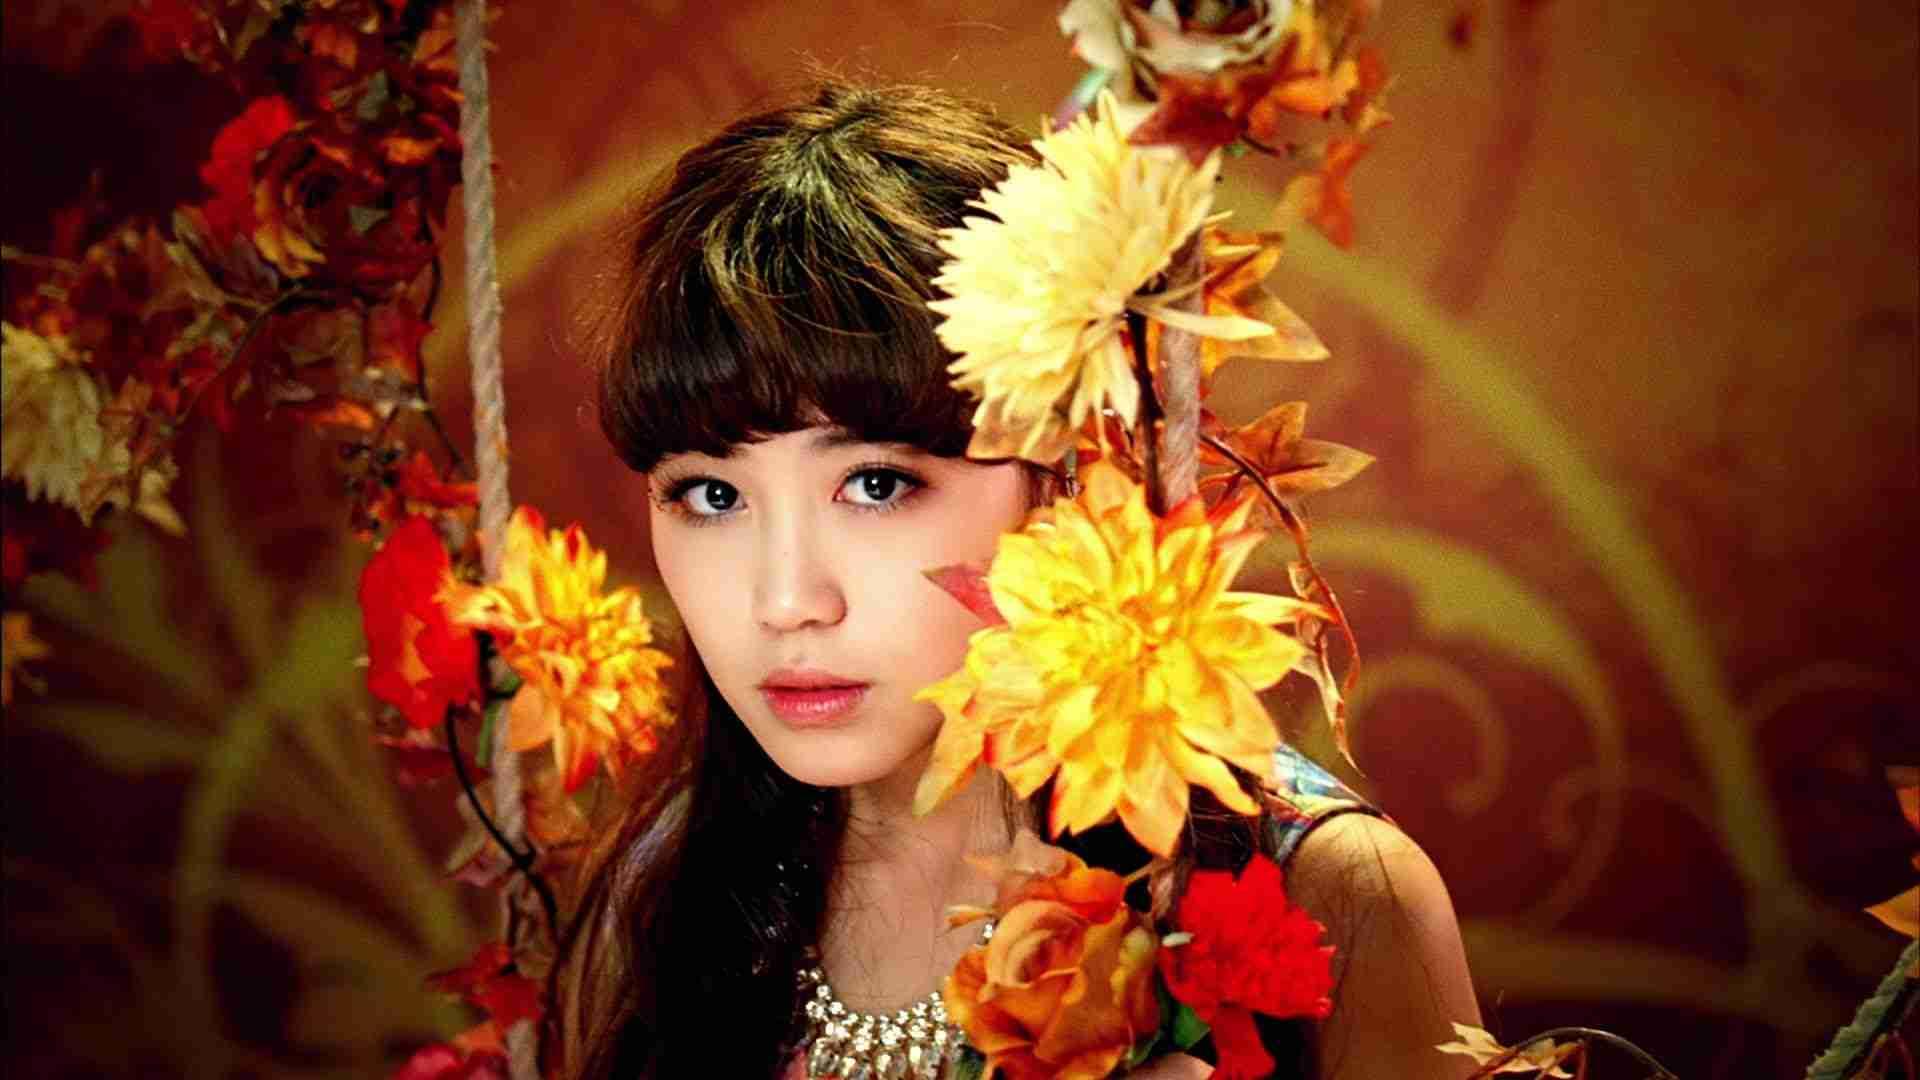 Flower 『let go again feat.VERBAL(m-flo)』 - YouTube